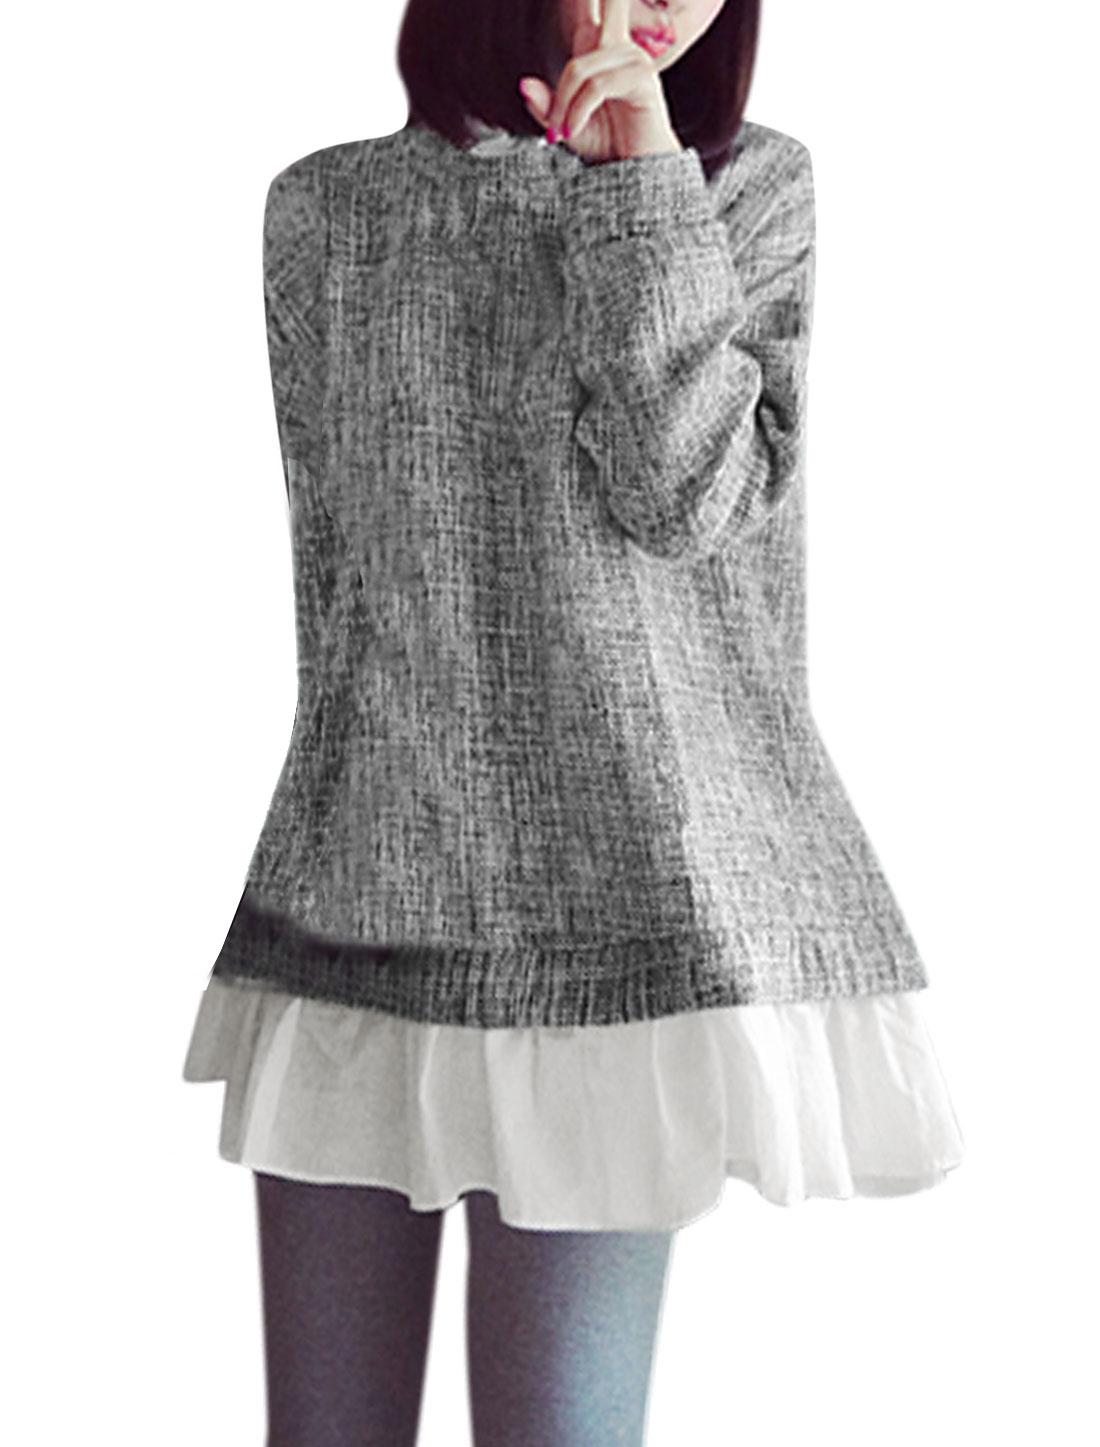 Women Ruffled Collar Panel Design Loose Tunic Top Gray S